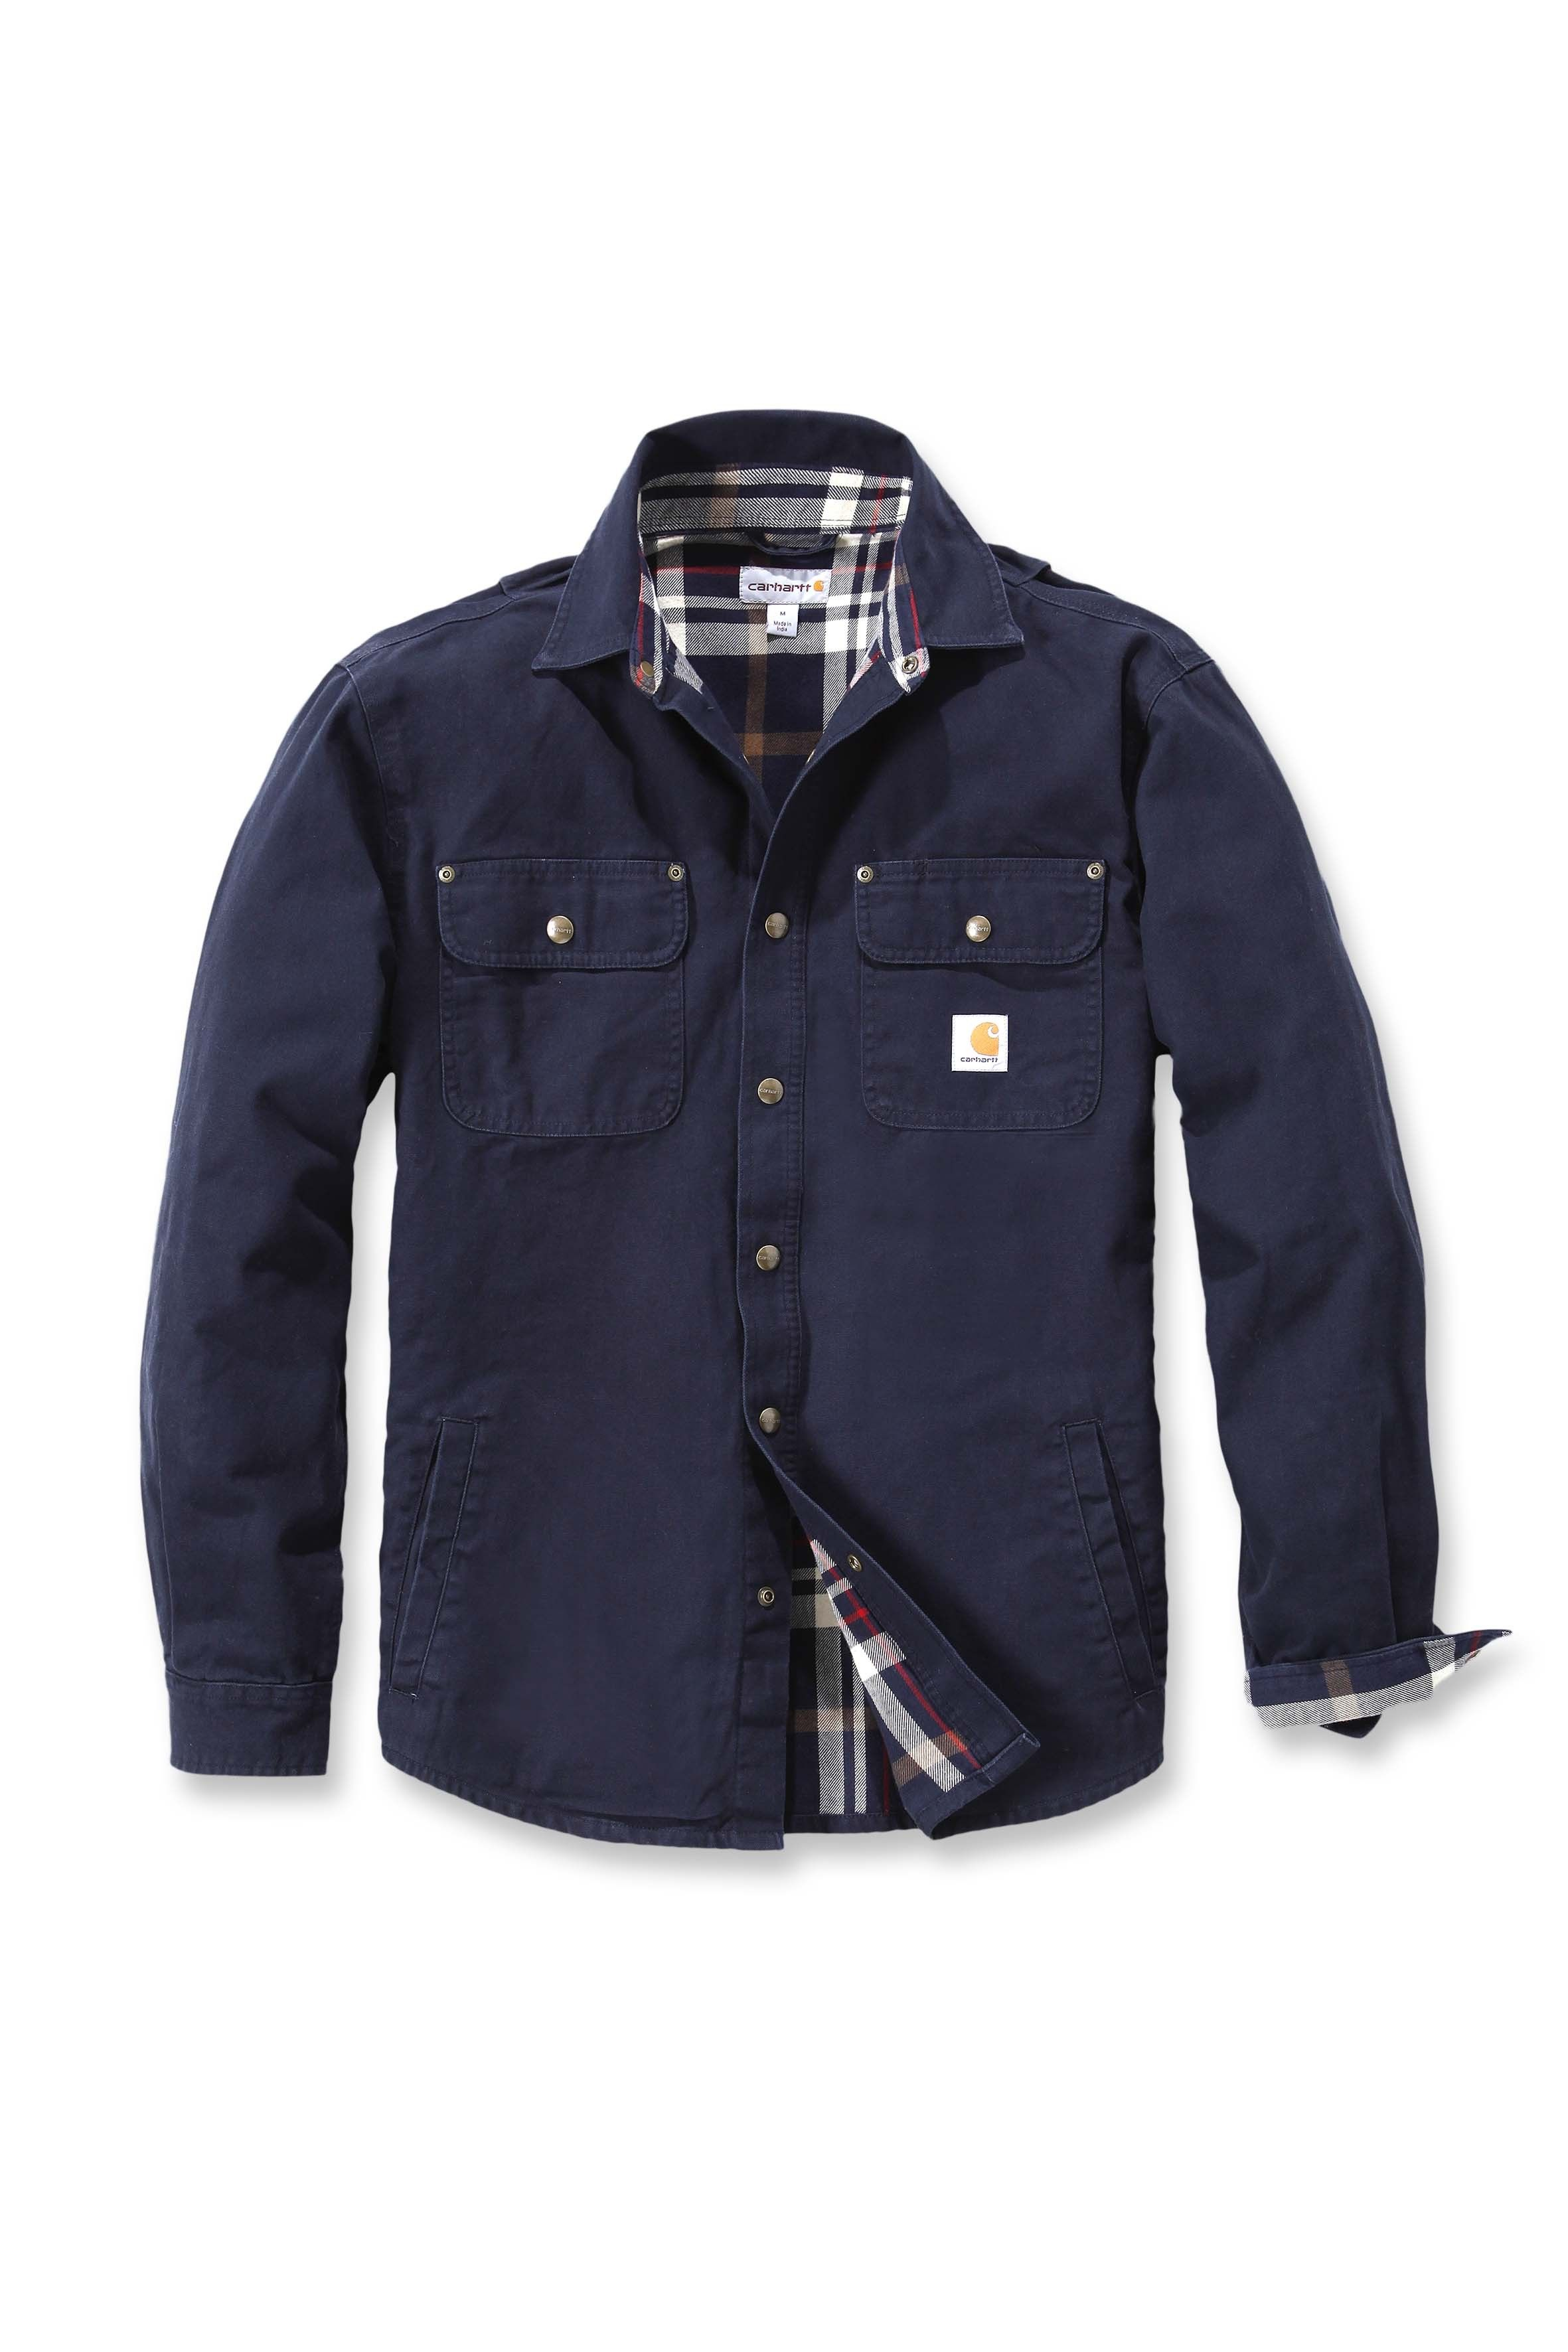 45ff1e1386 Carhartt Weathered Canvas Shirt Jacket Navy